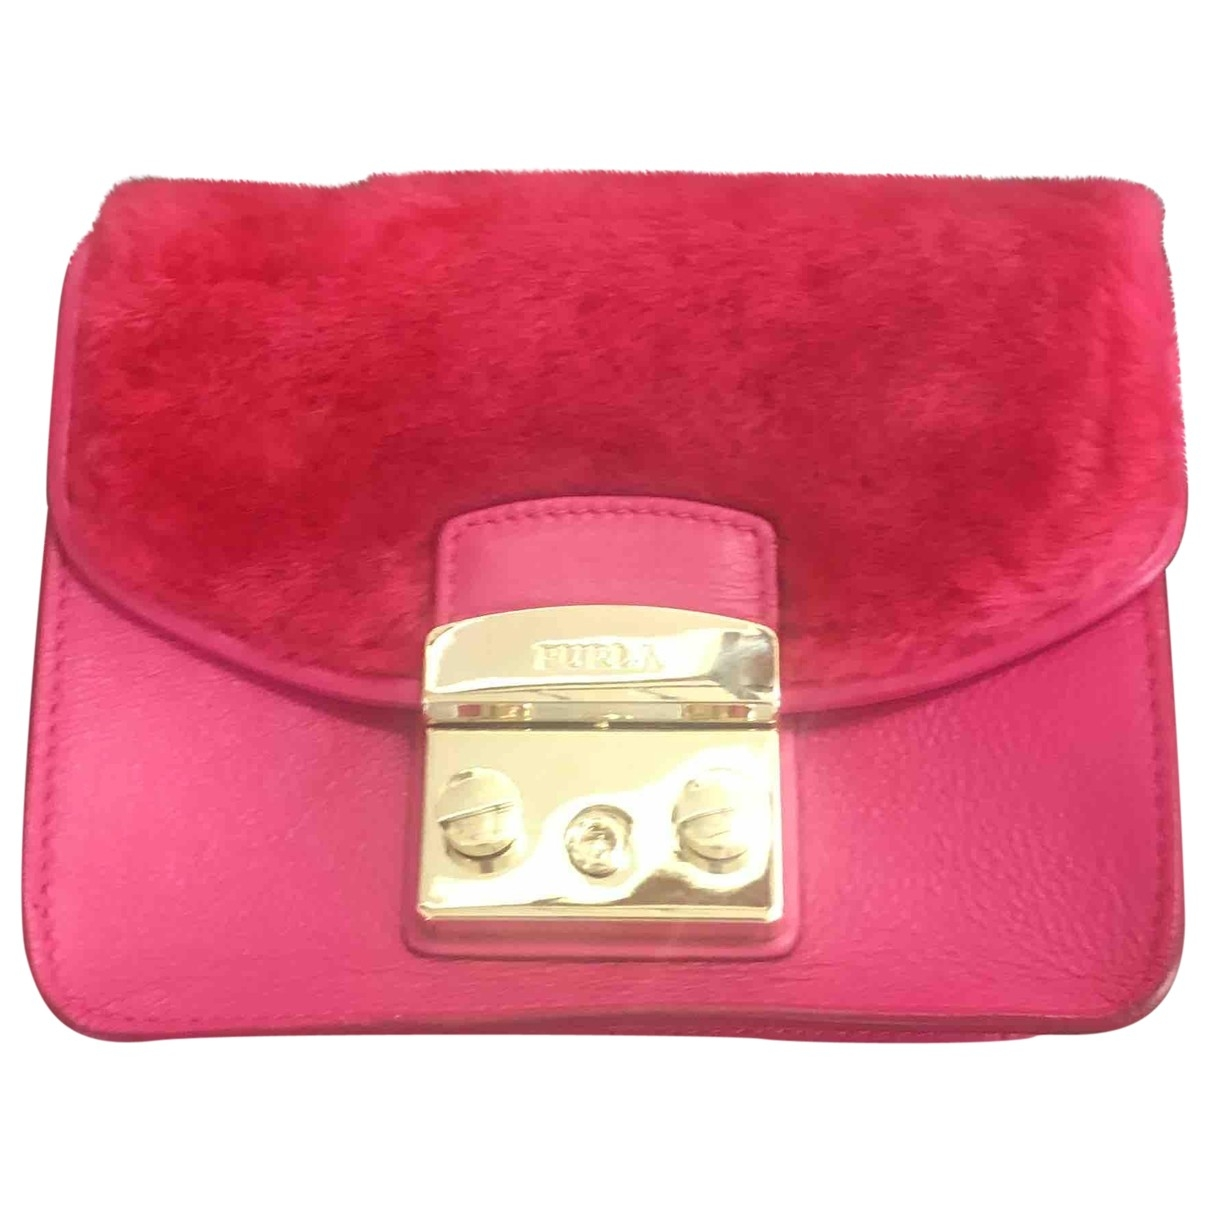 Furla Metropolis Pink Leather Clutch bag for Women \N